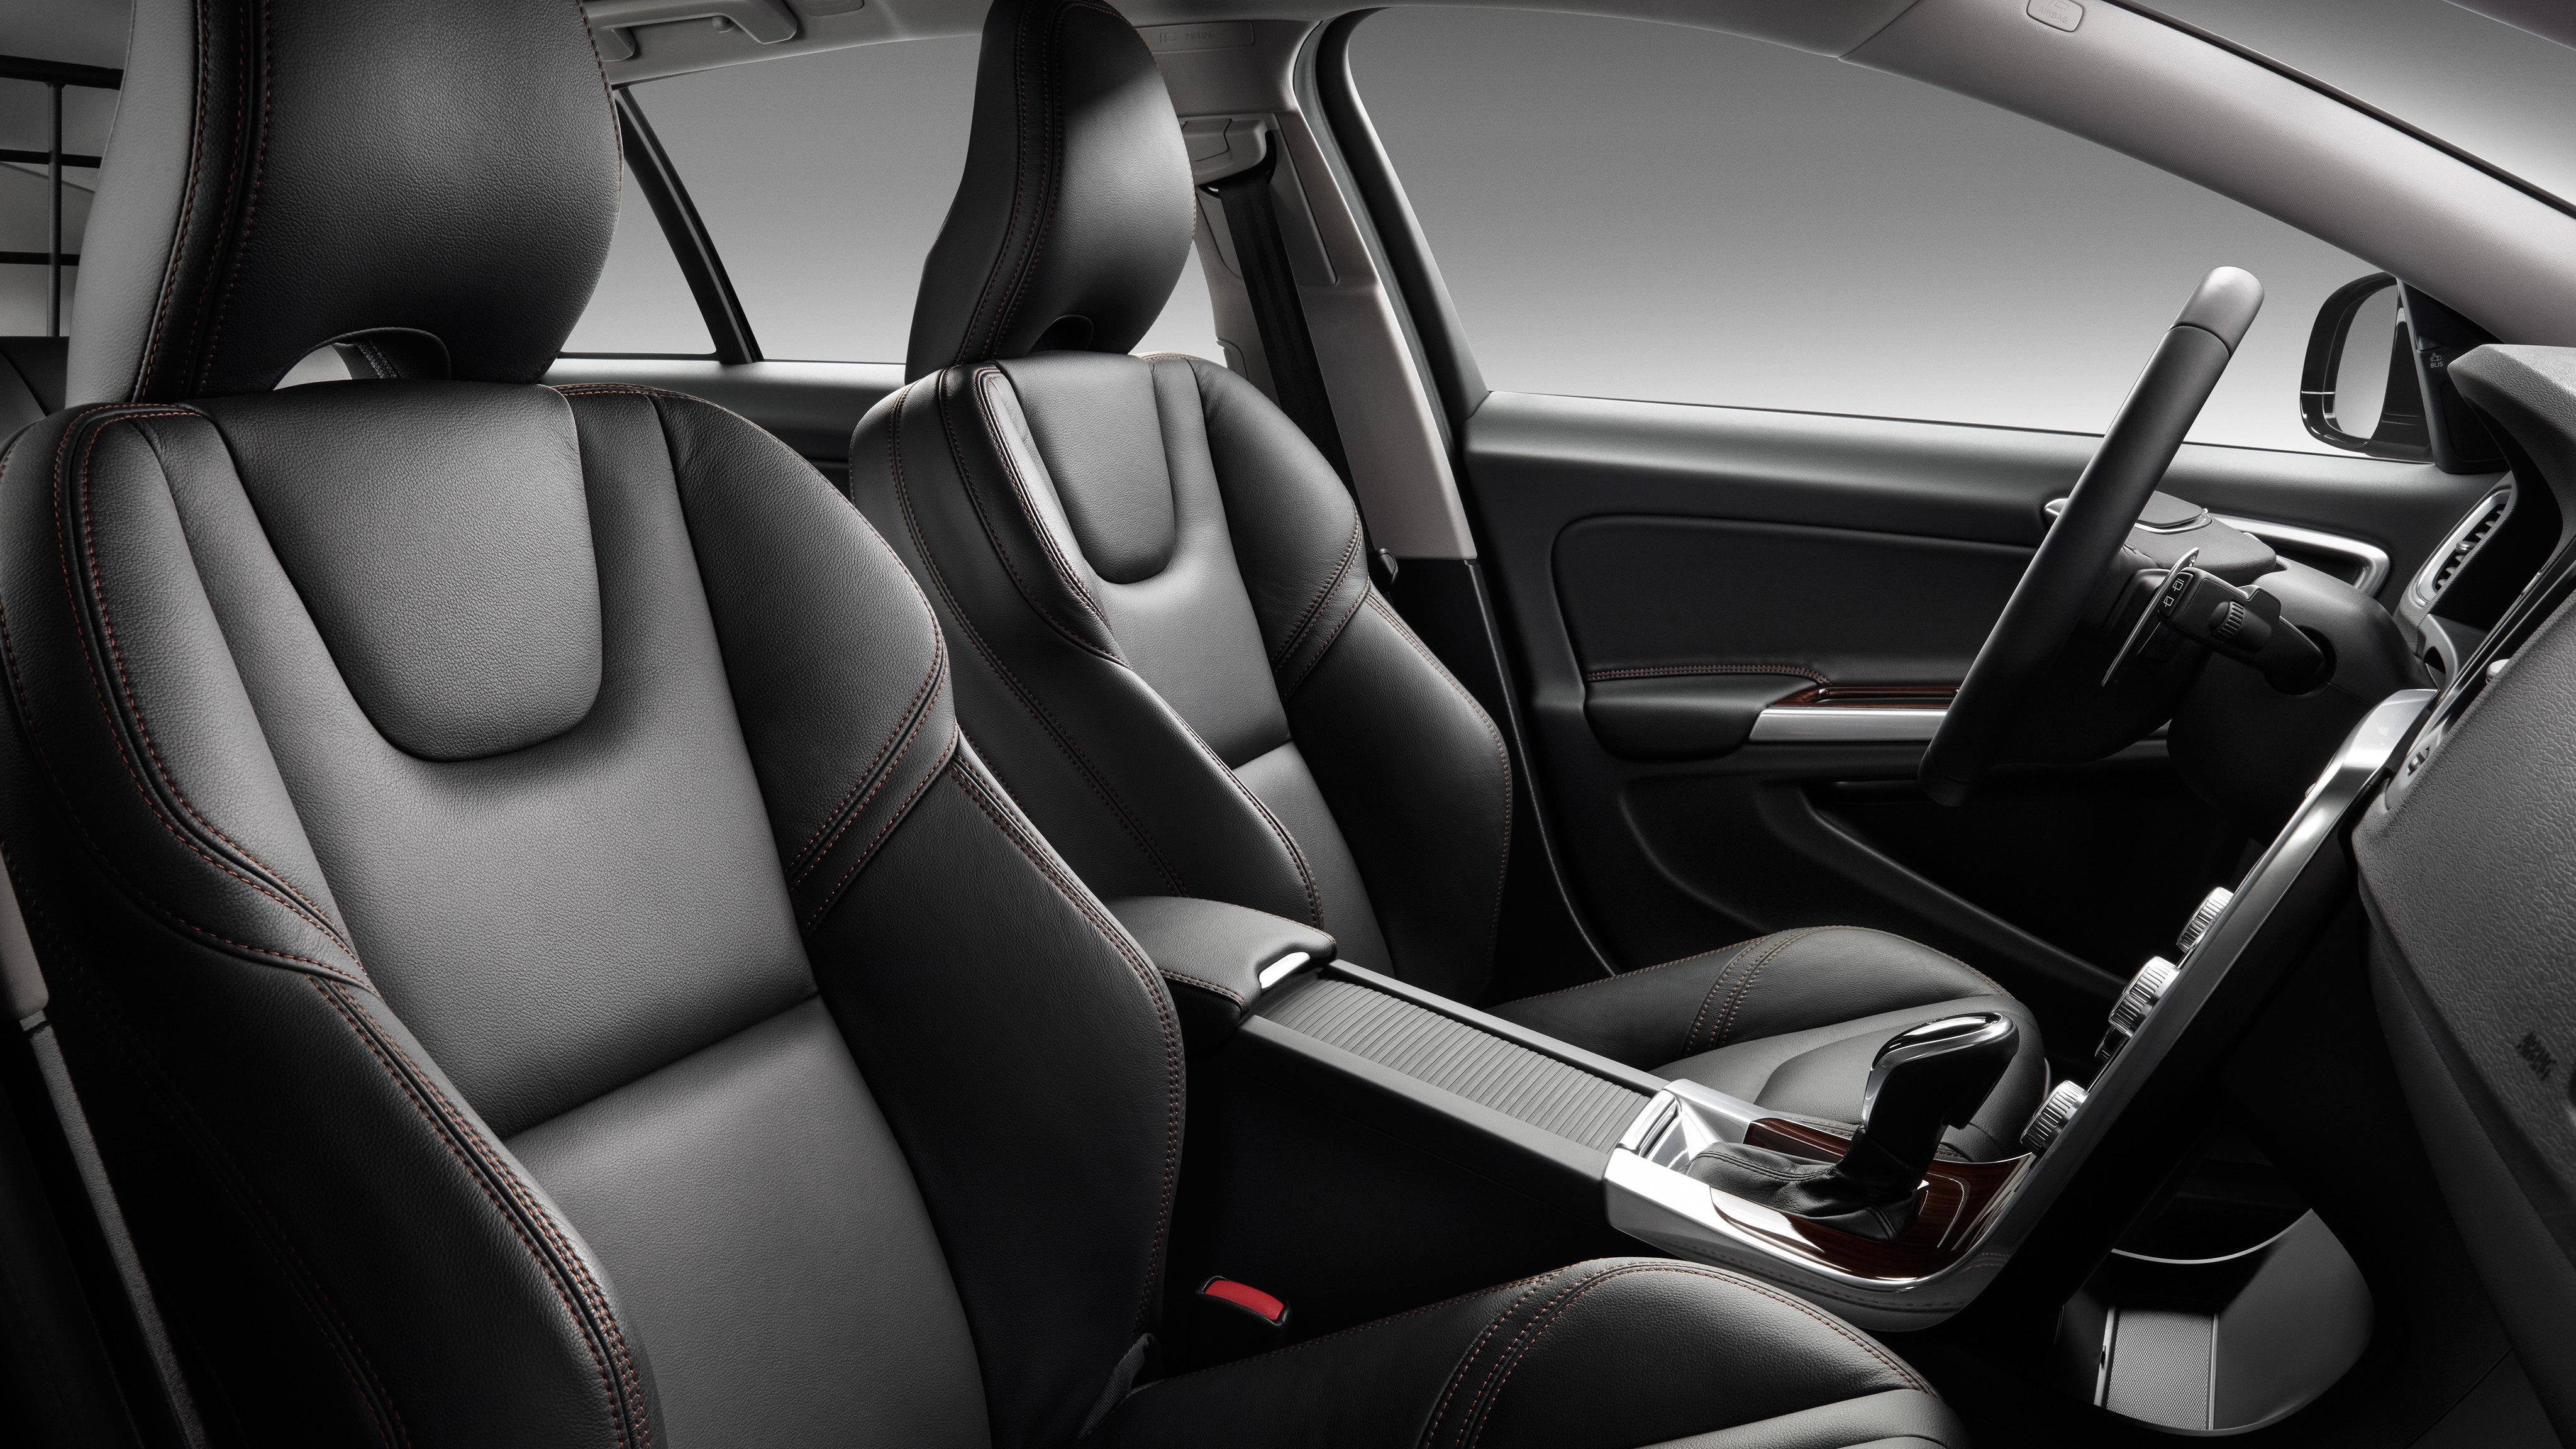 Volvo V60 Price & Lease Deals | Keystone Volvo | Doylestown PA